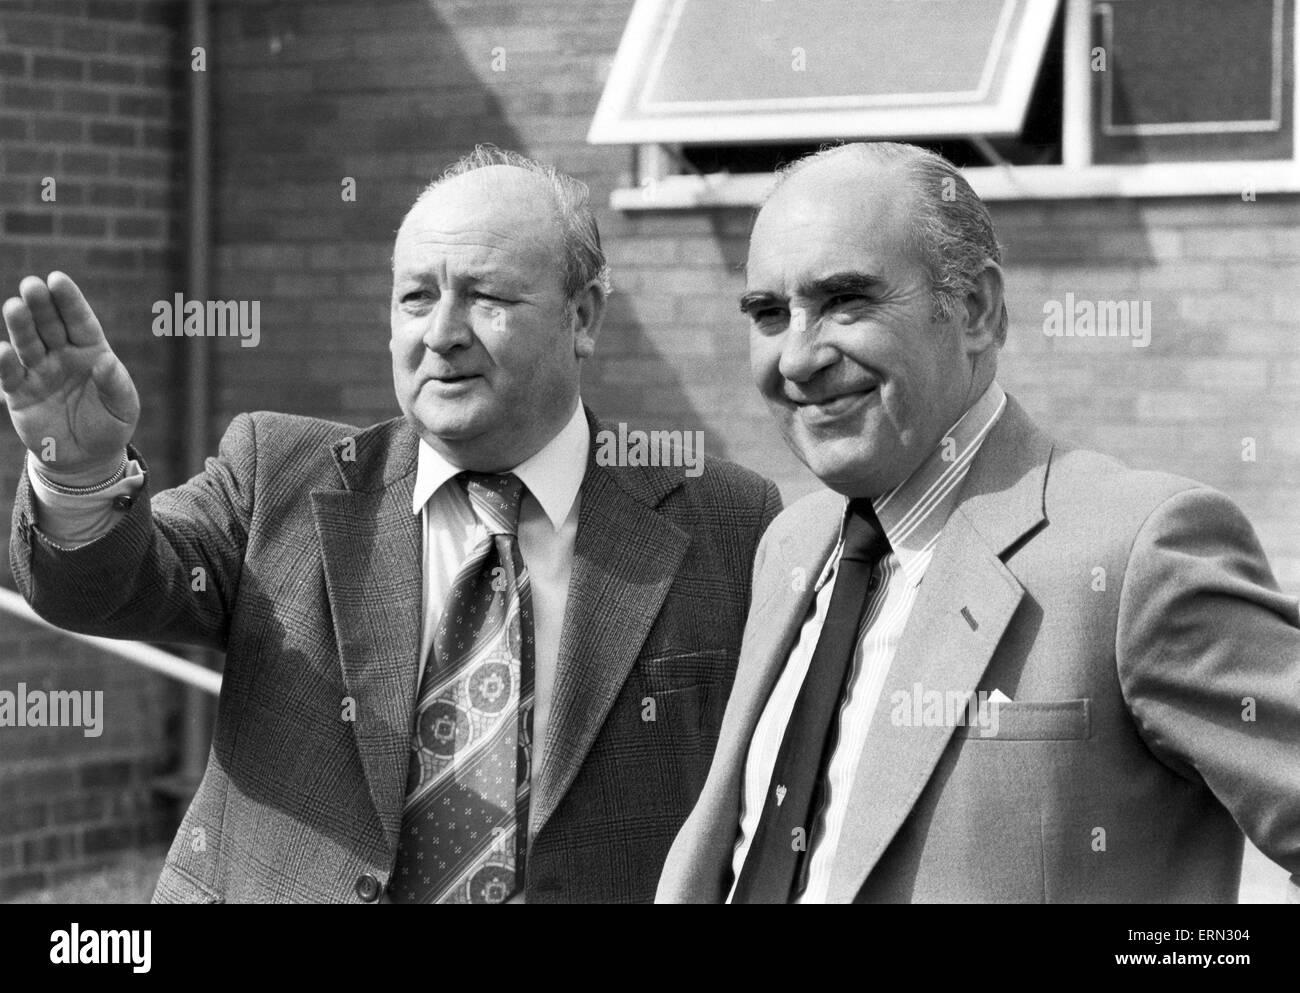 Birmingham City manager Sir Alf Ramsey with Club Secretary Alan Instone, November 1977. - Stock Image